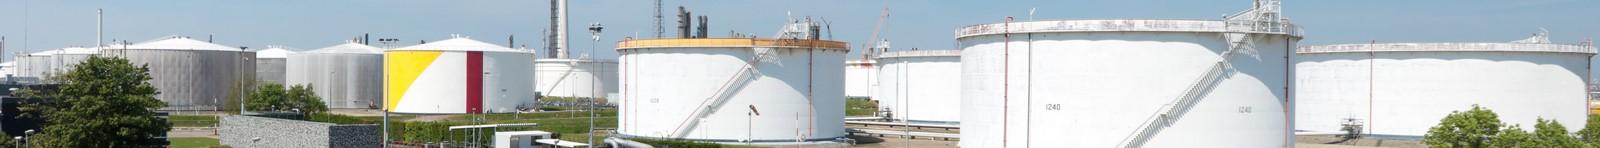 storage tanks Geodesic Domes vapour voc emission contorl 2